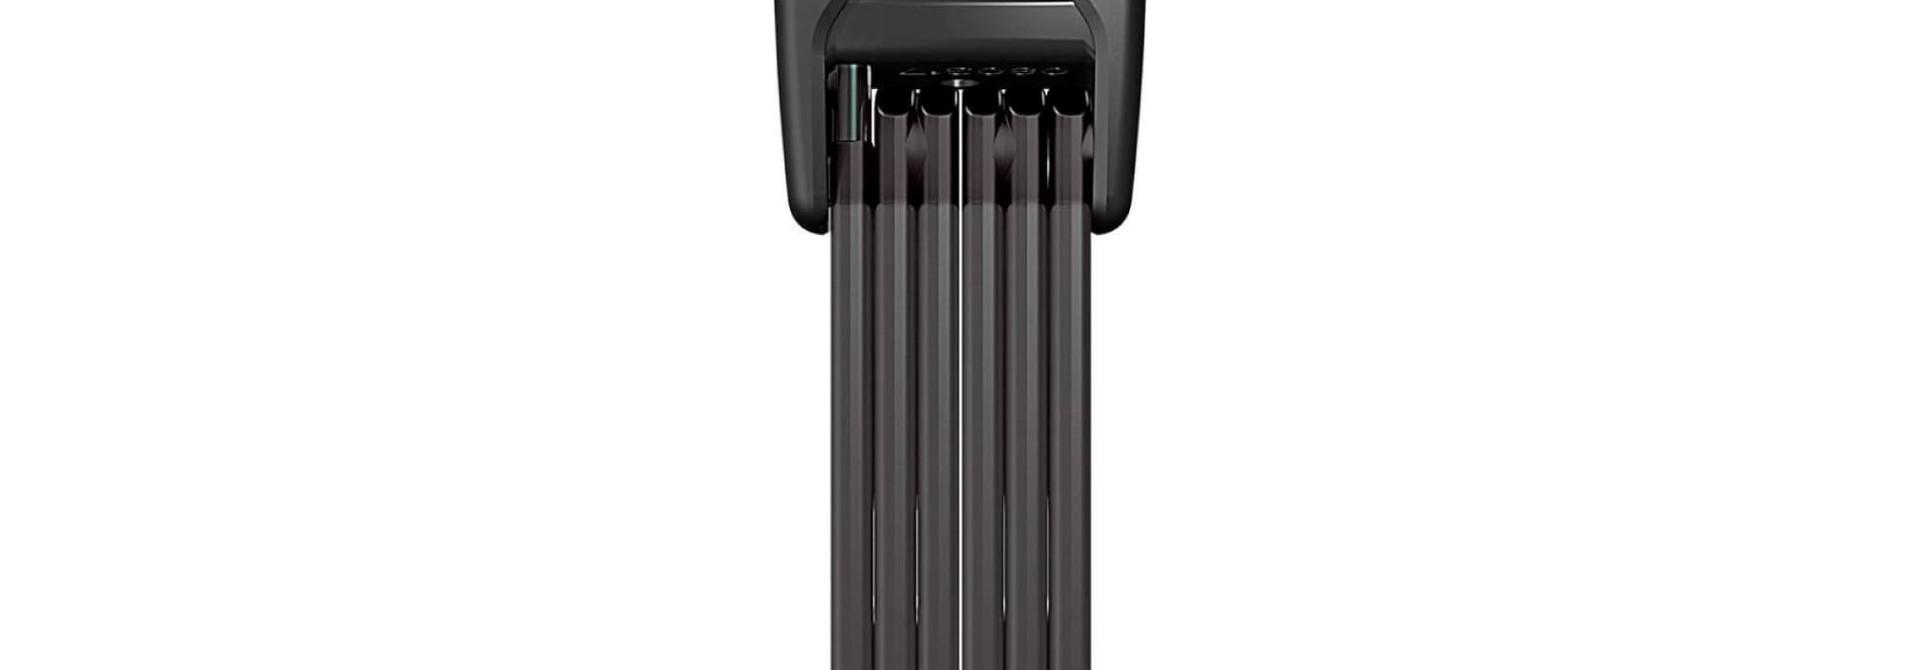 Lock Bordo 6000 Alarm Black 90cm